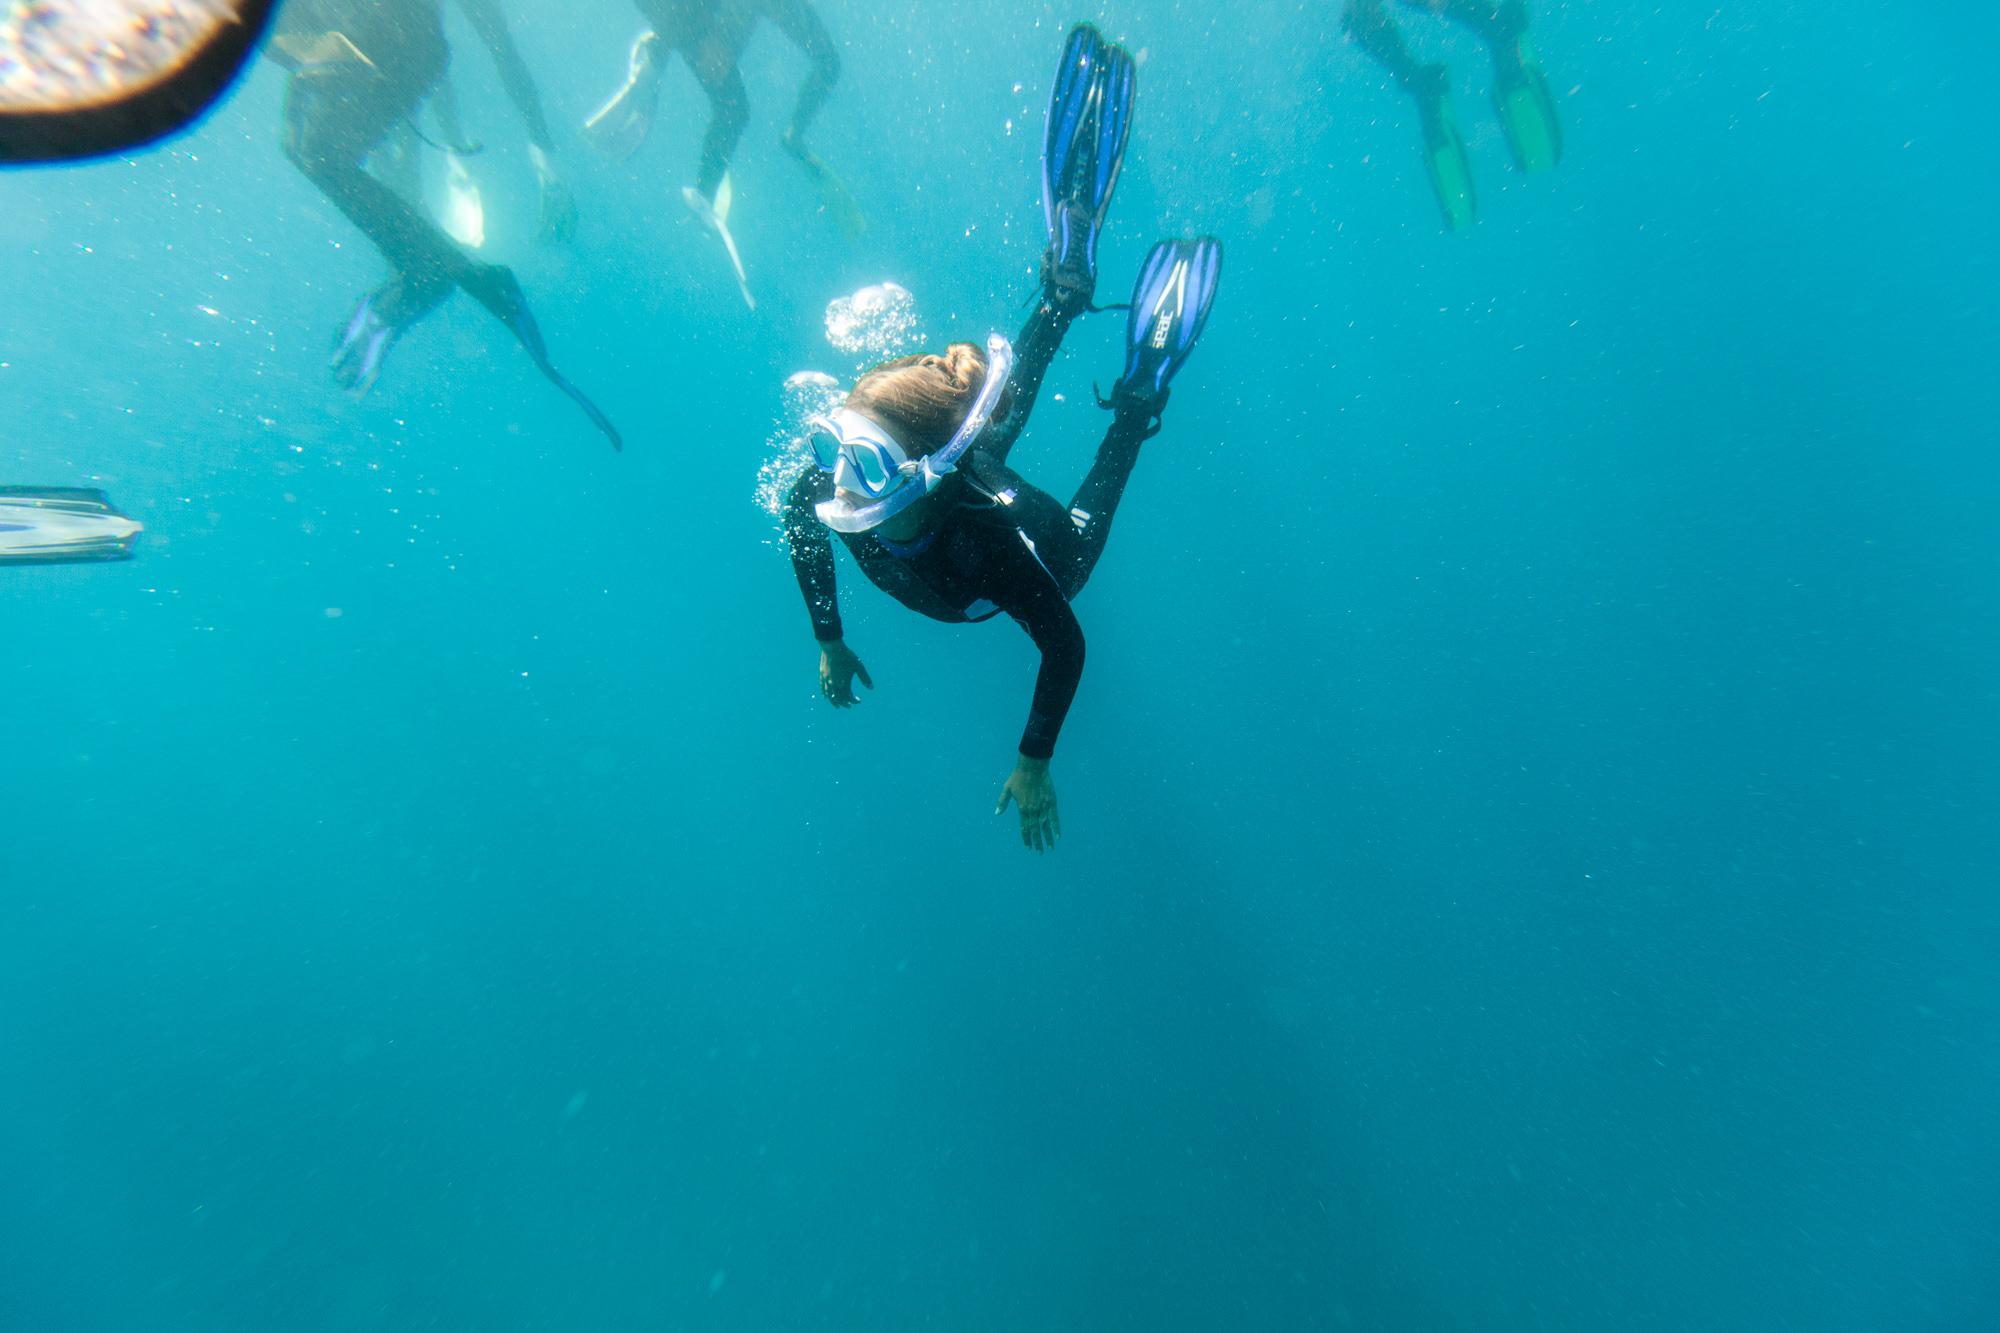 Manta Ray Snorkel - The Remote Resort, Fiji Islands - Fiji Resort